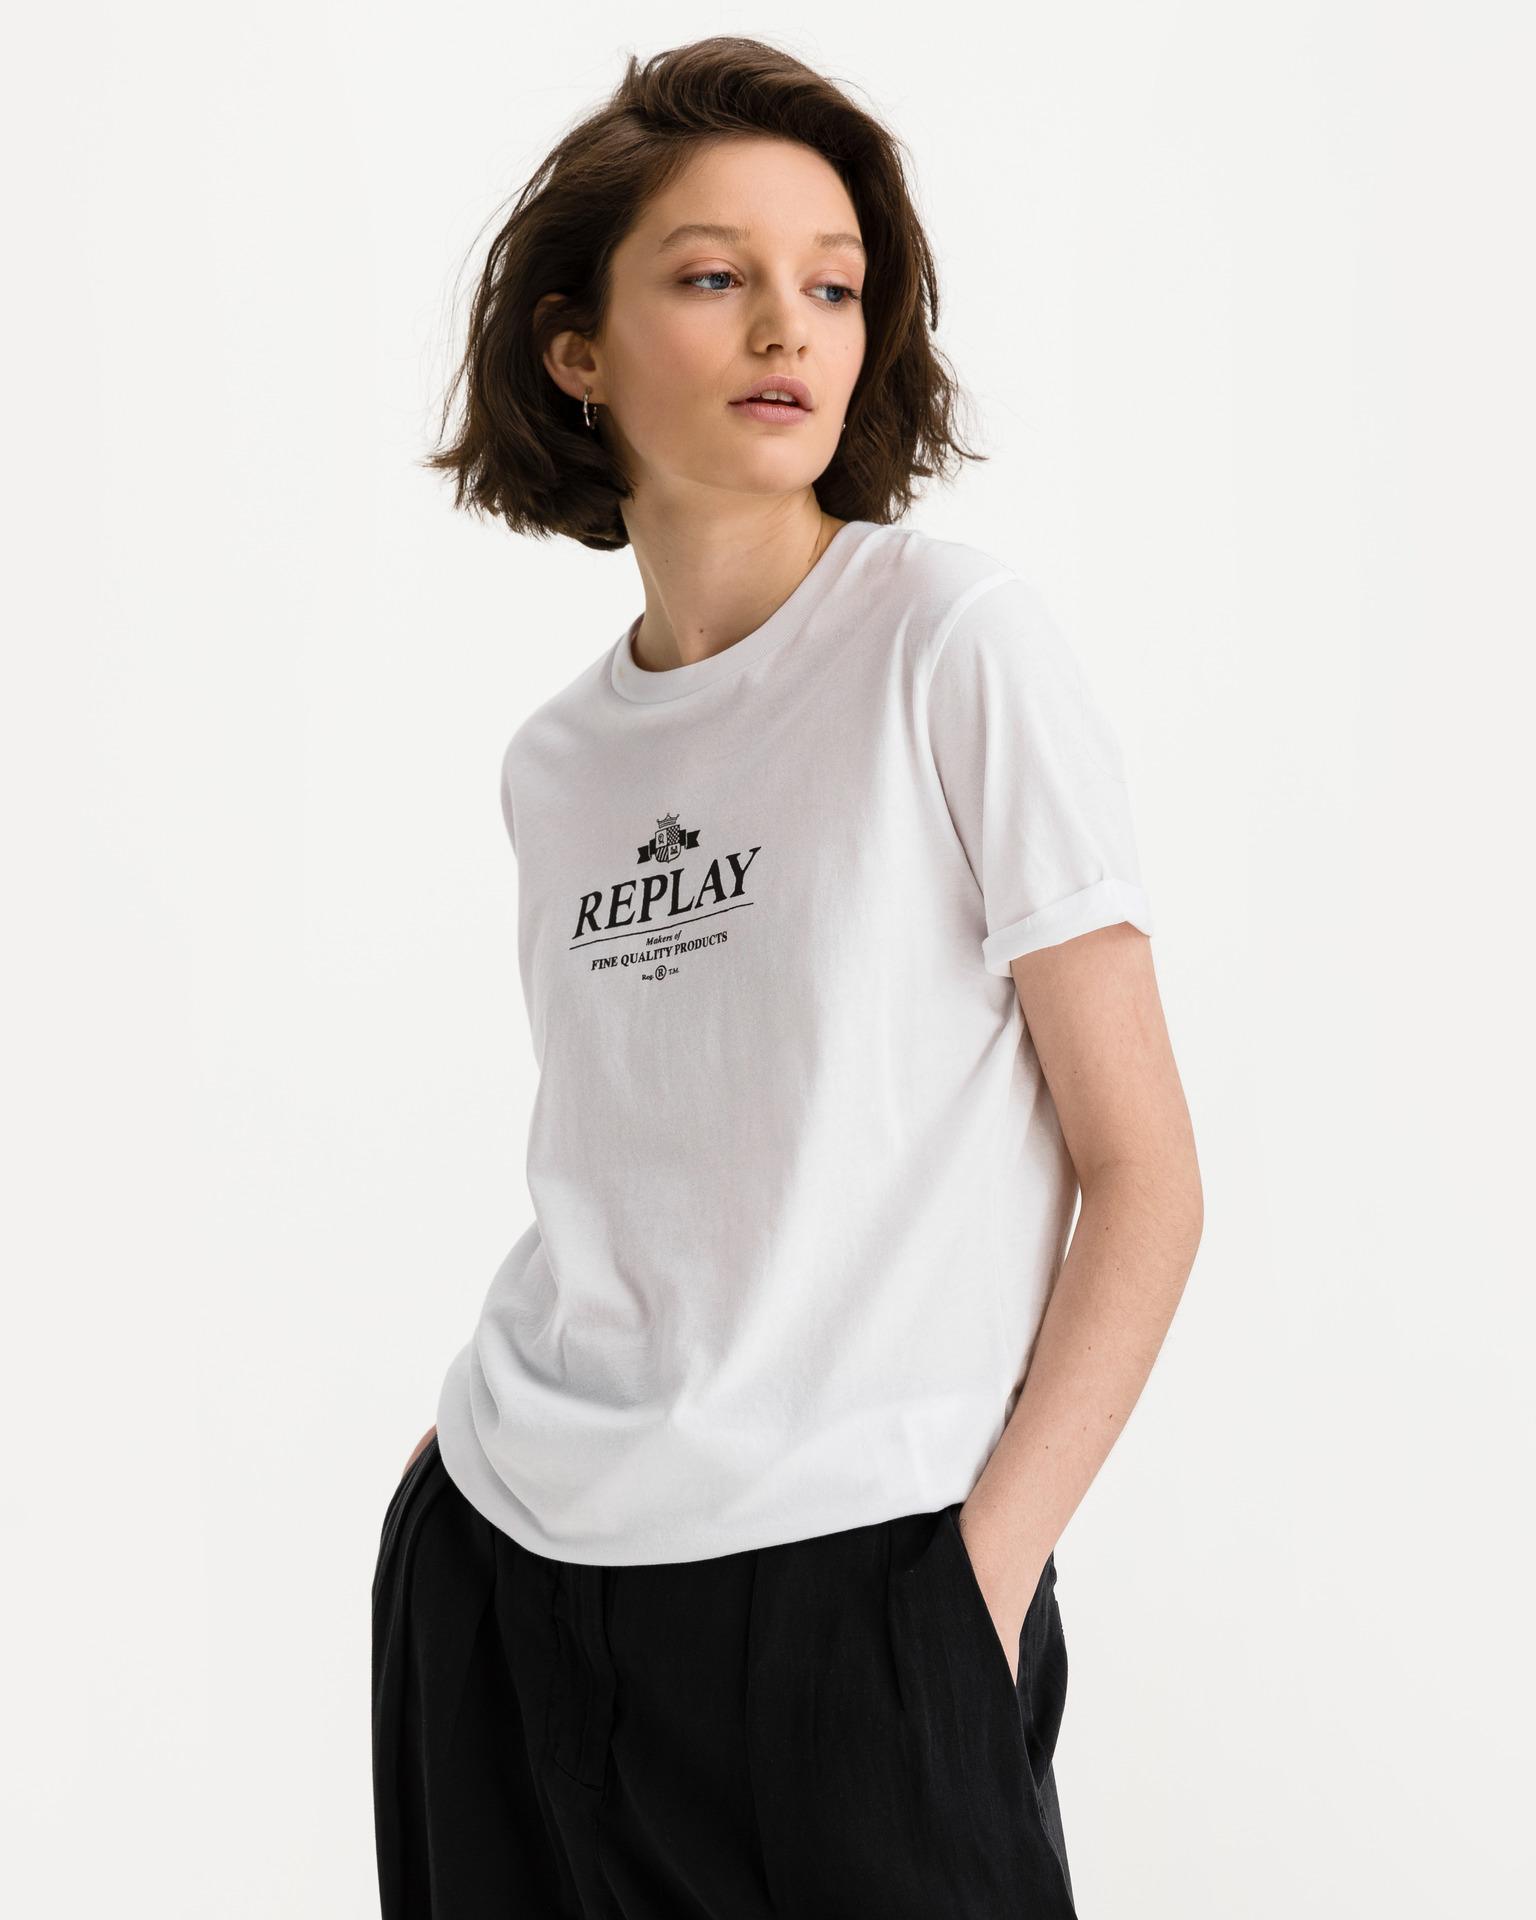 Replay Koszulka damska biały